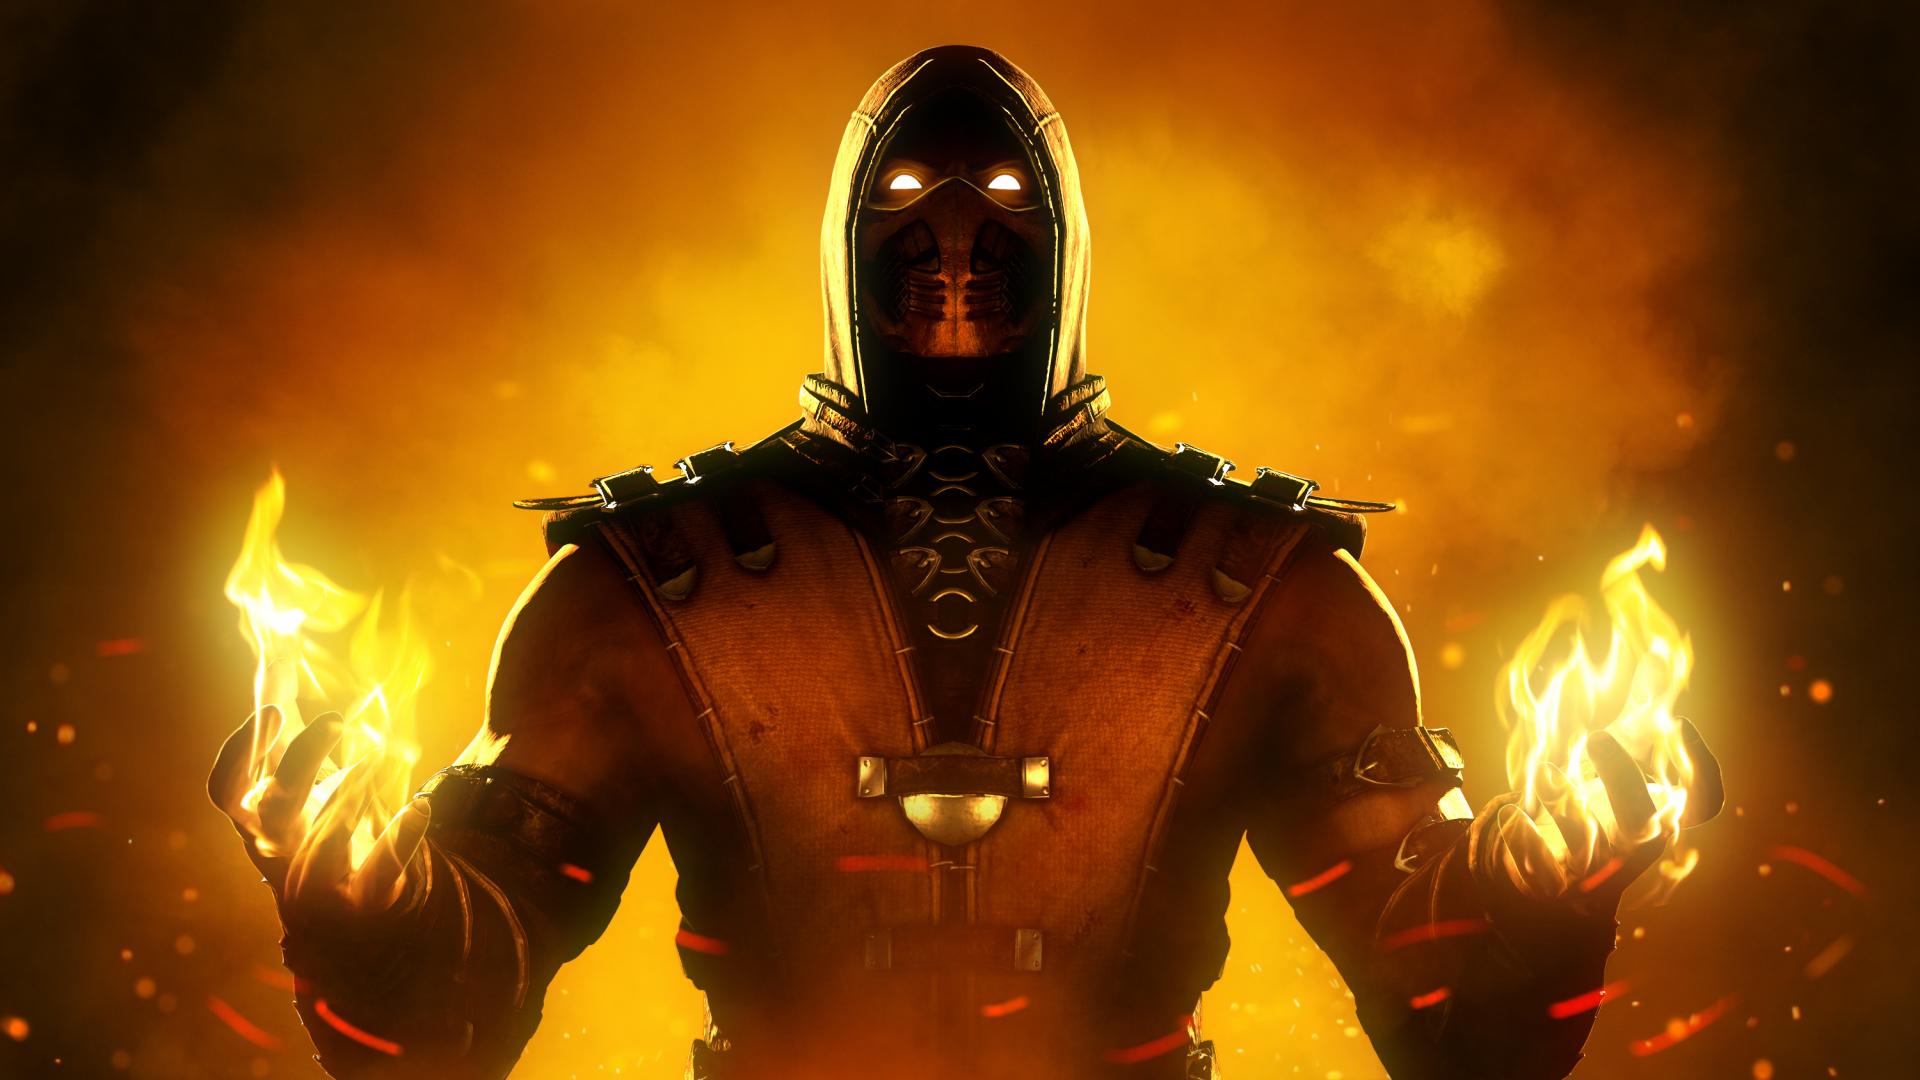 Download 1920x1080 Wallpaper Scorpion Mortal Kombat X Video Game